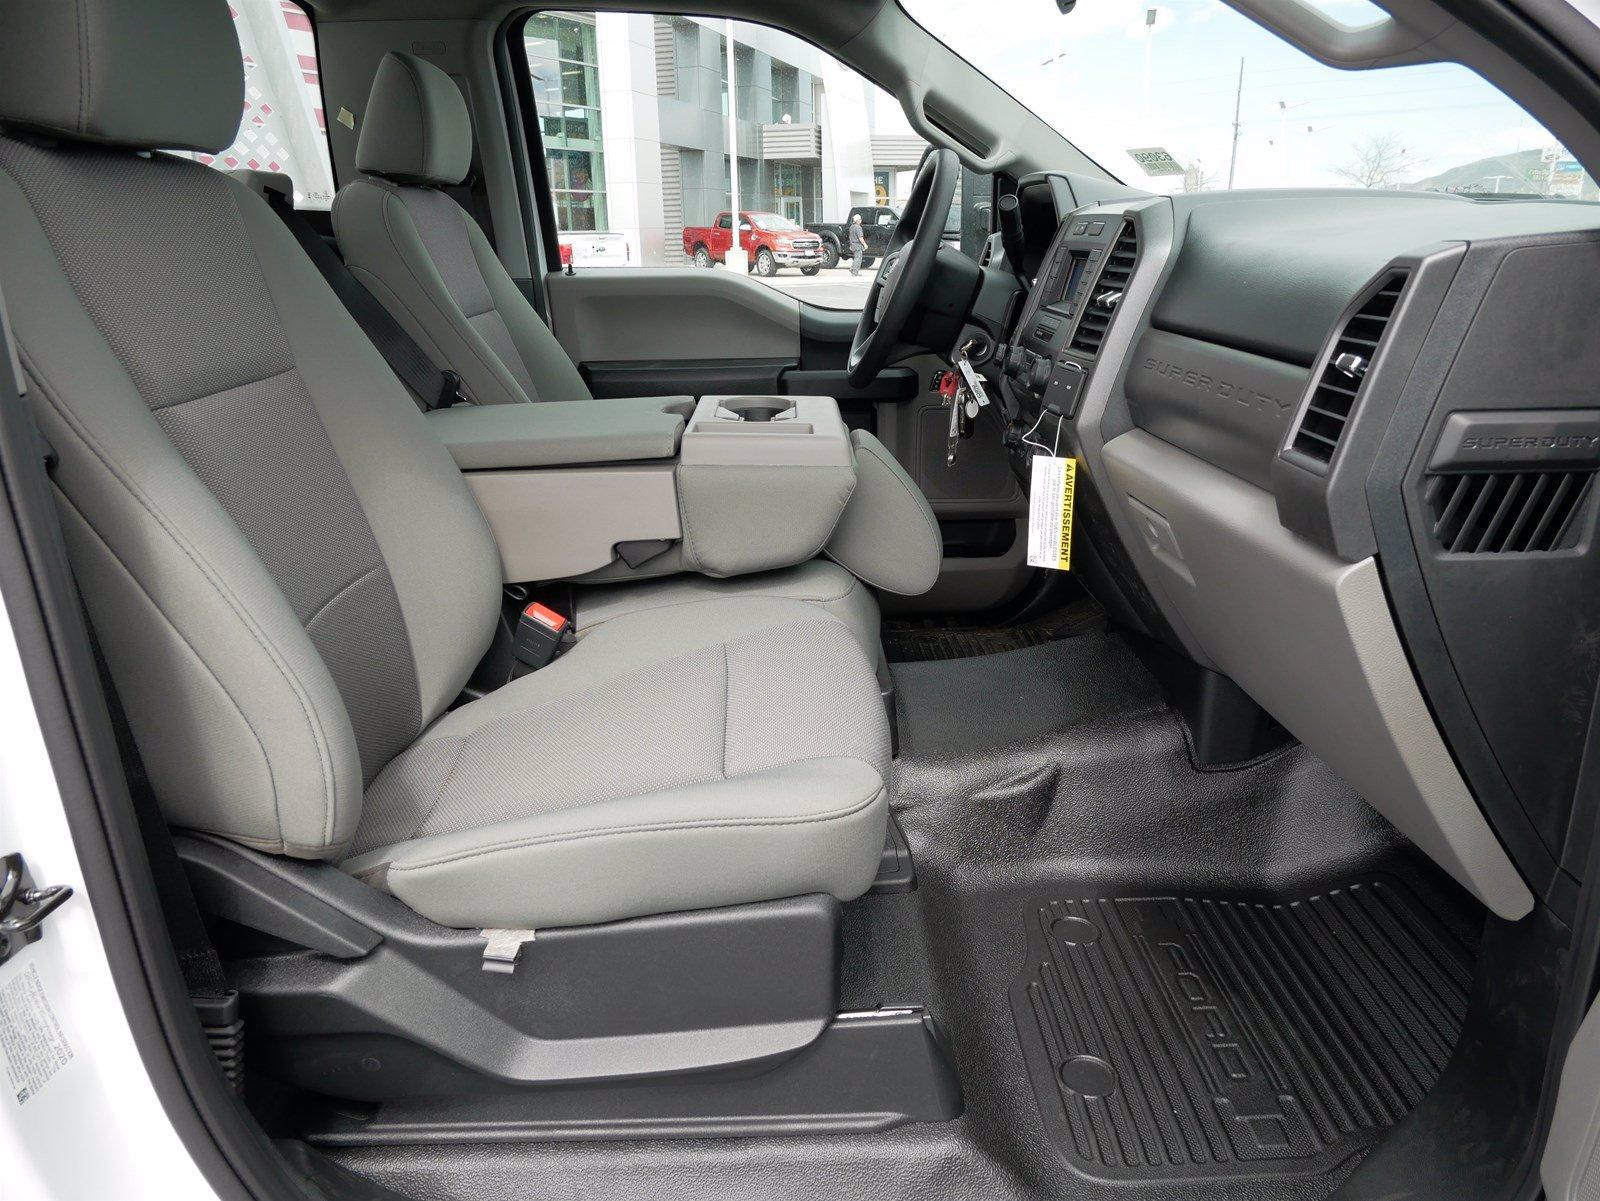 2020 Ford F-550 Regular Cab DRW 4x4, Scelzi CTFB Contractor Body #63090 - photo 28